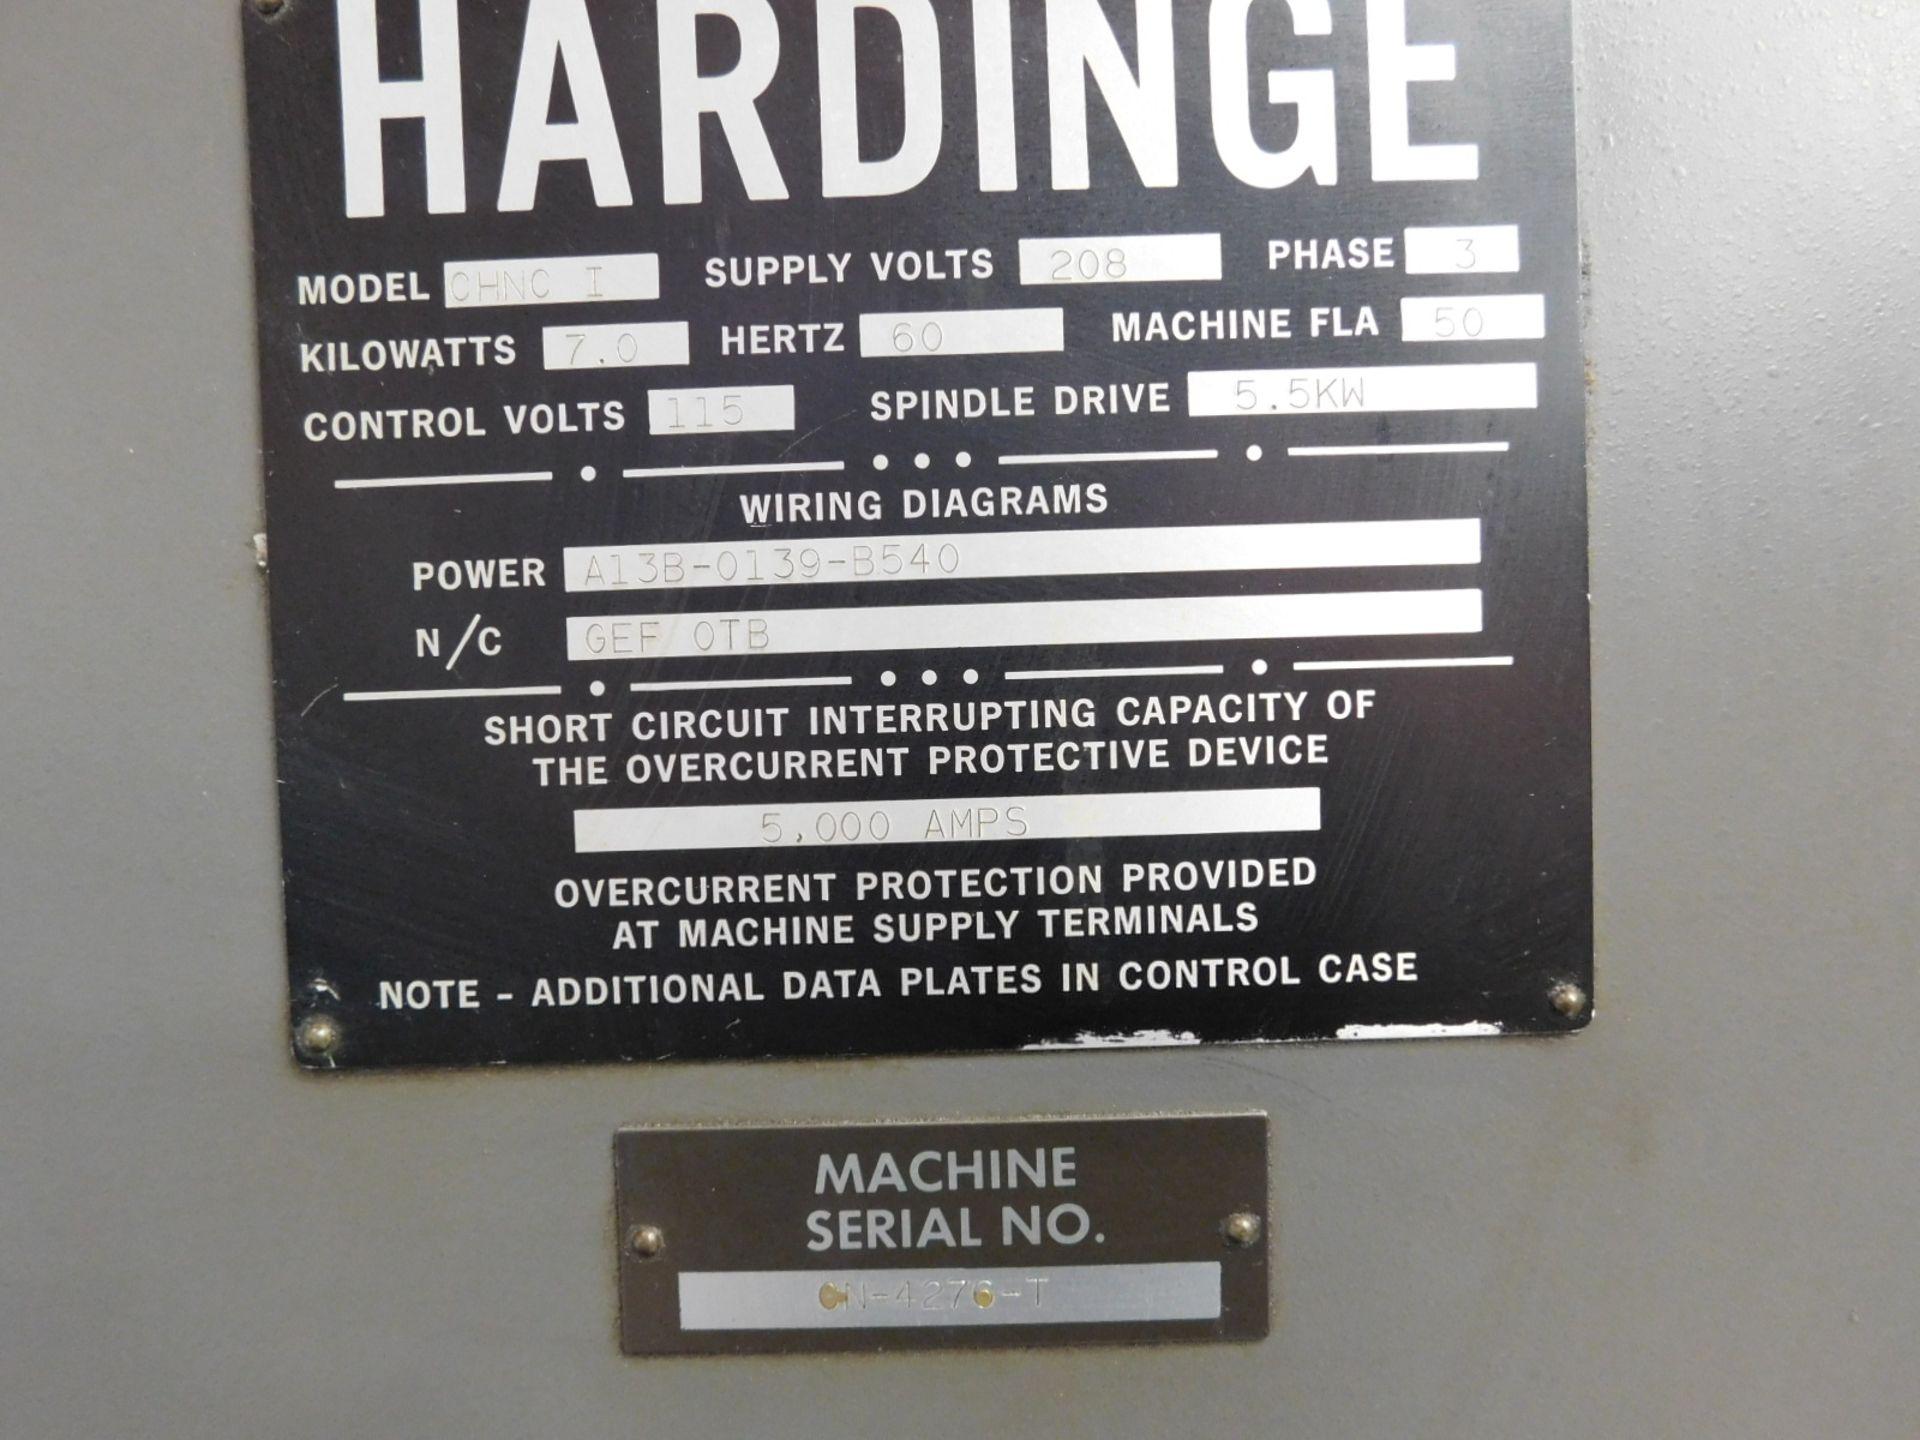 HARDINGE CHNC-I CNC LATHE, GE FANUC OT CNC CONTROL, SPACE TURN BARFEED, S/N CN-4276T - Image 8 of 16